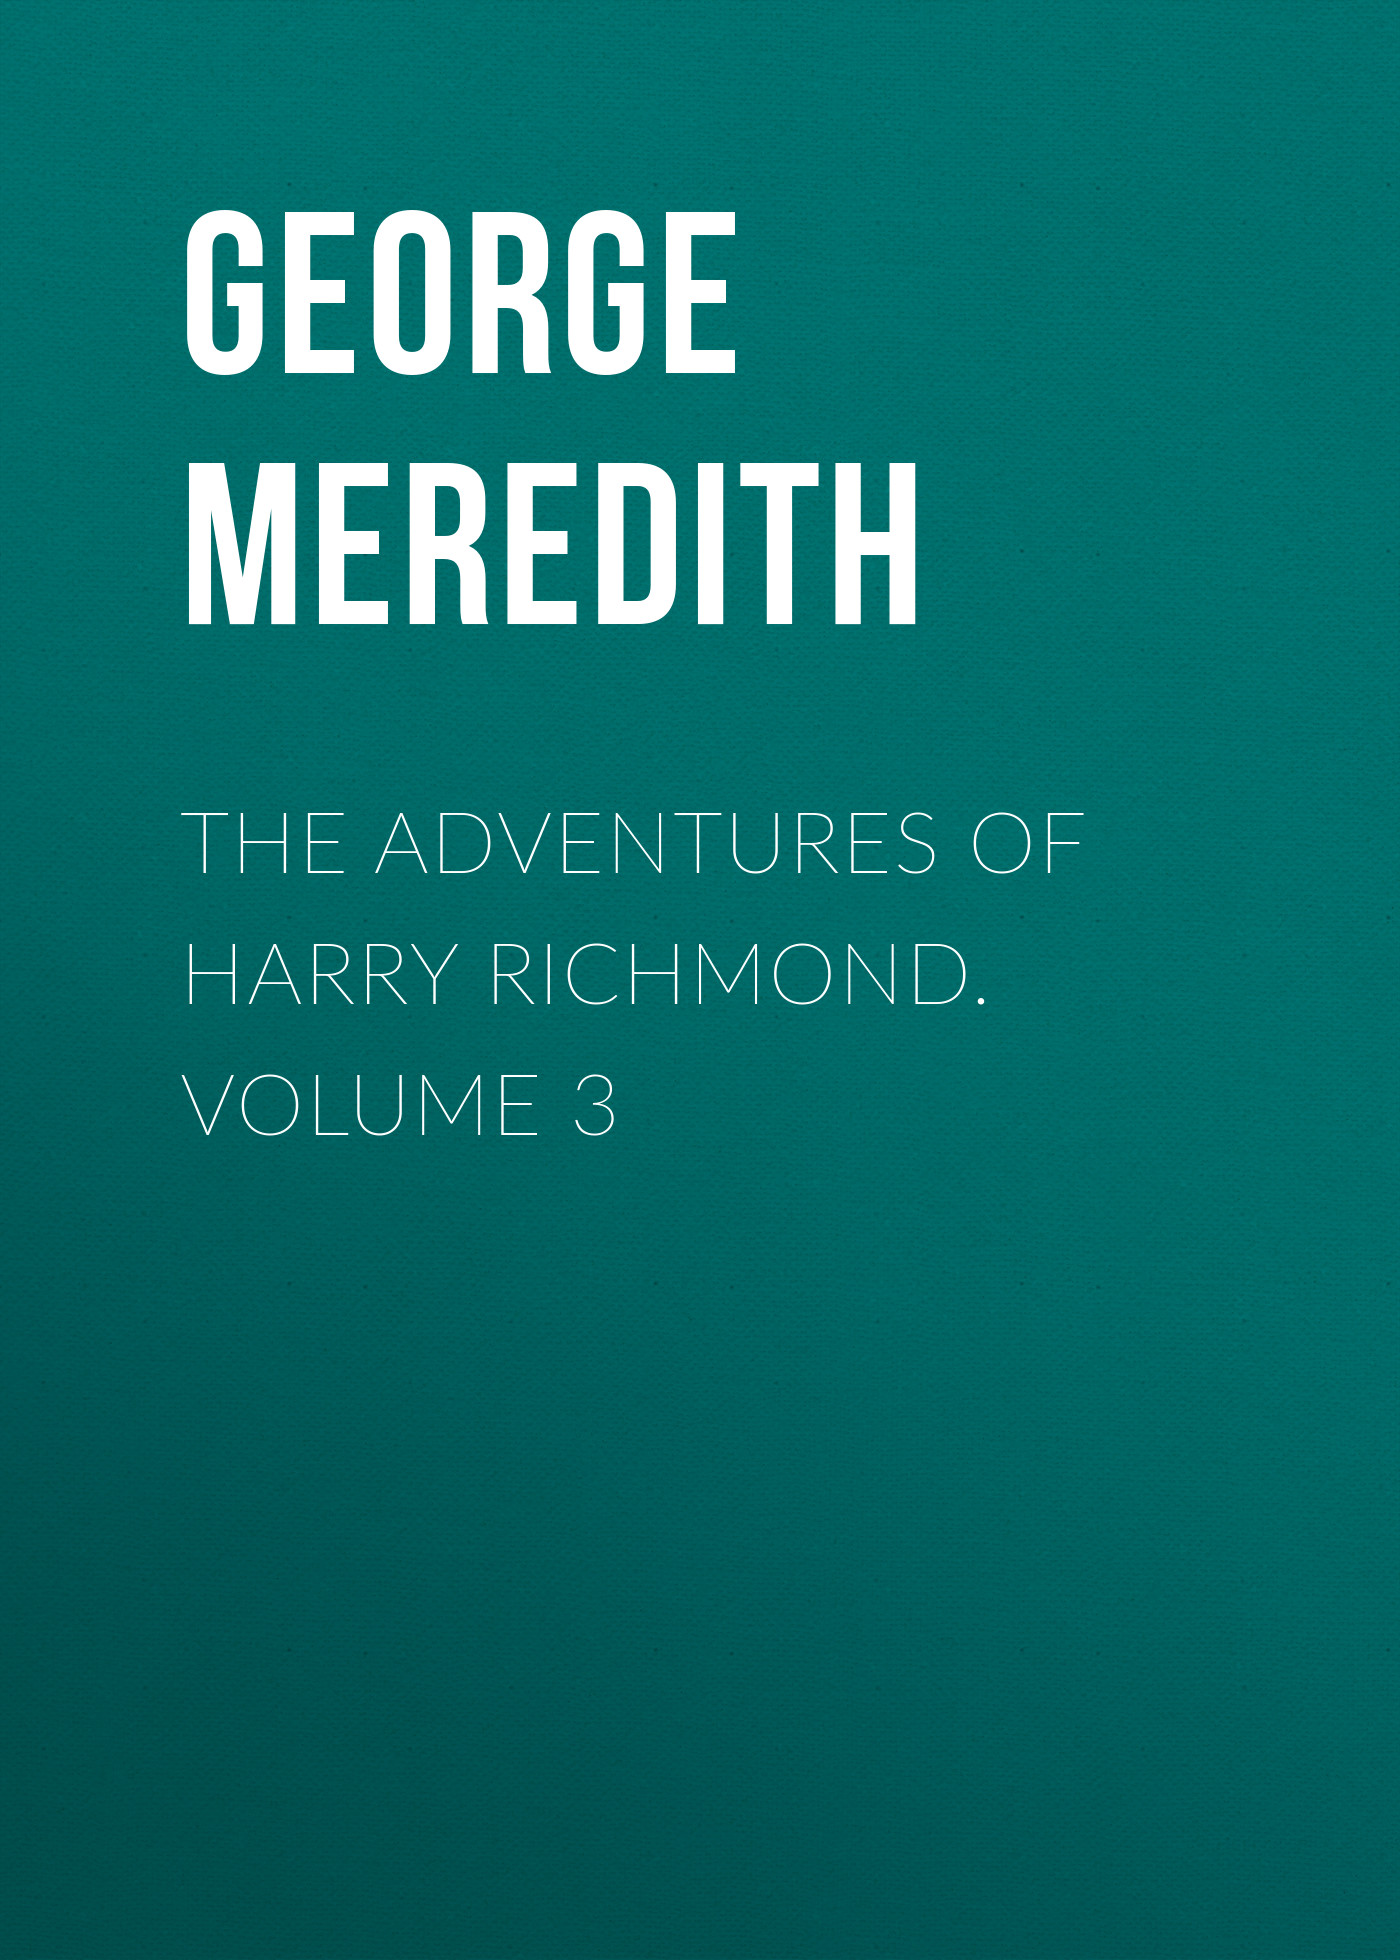 George Meredith The Adventures of Harry Richmond. Volume 3 sala george augustus the strange adventures of captain dangerous volume 1